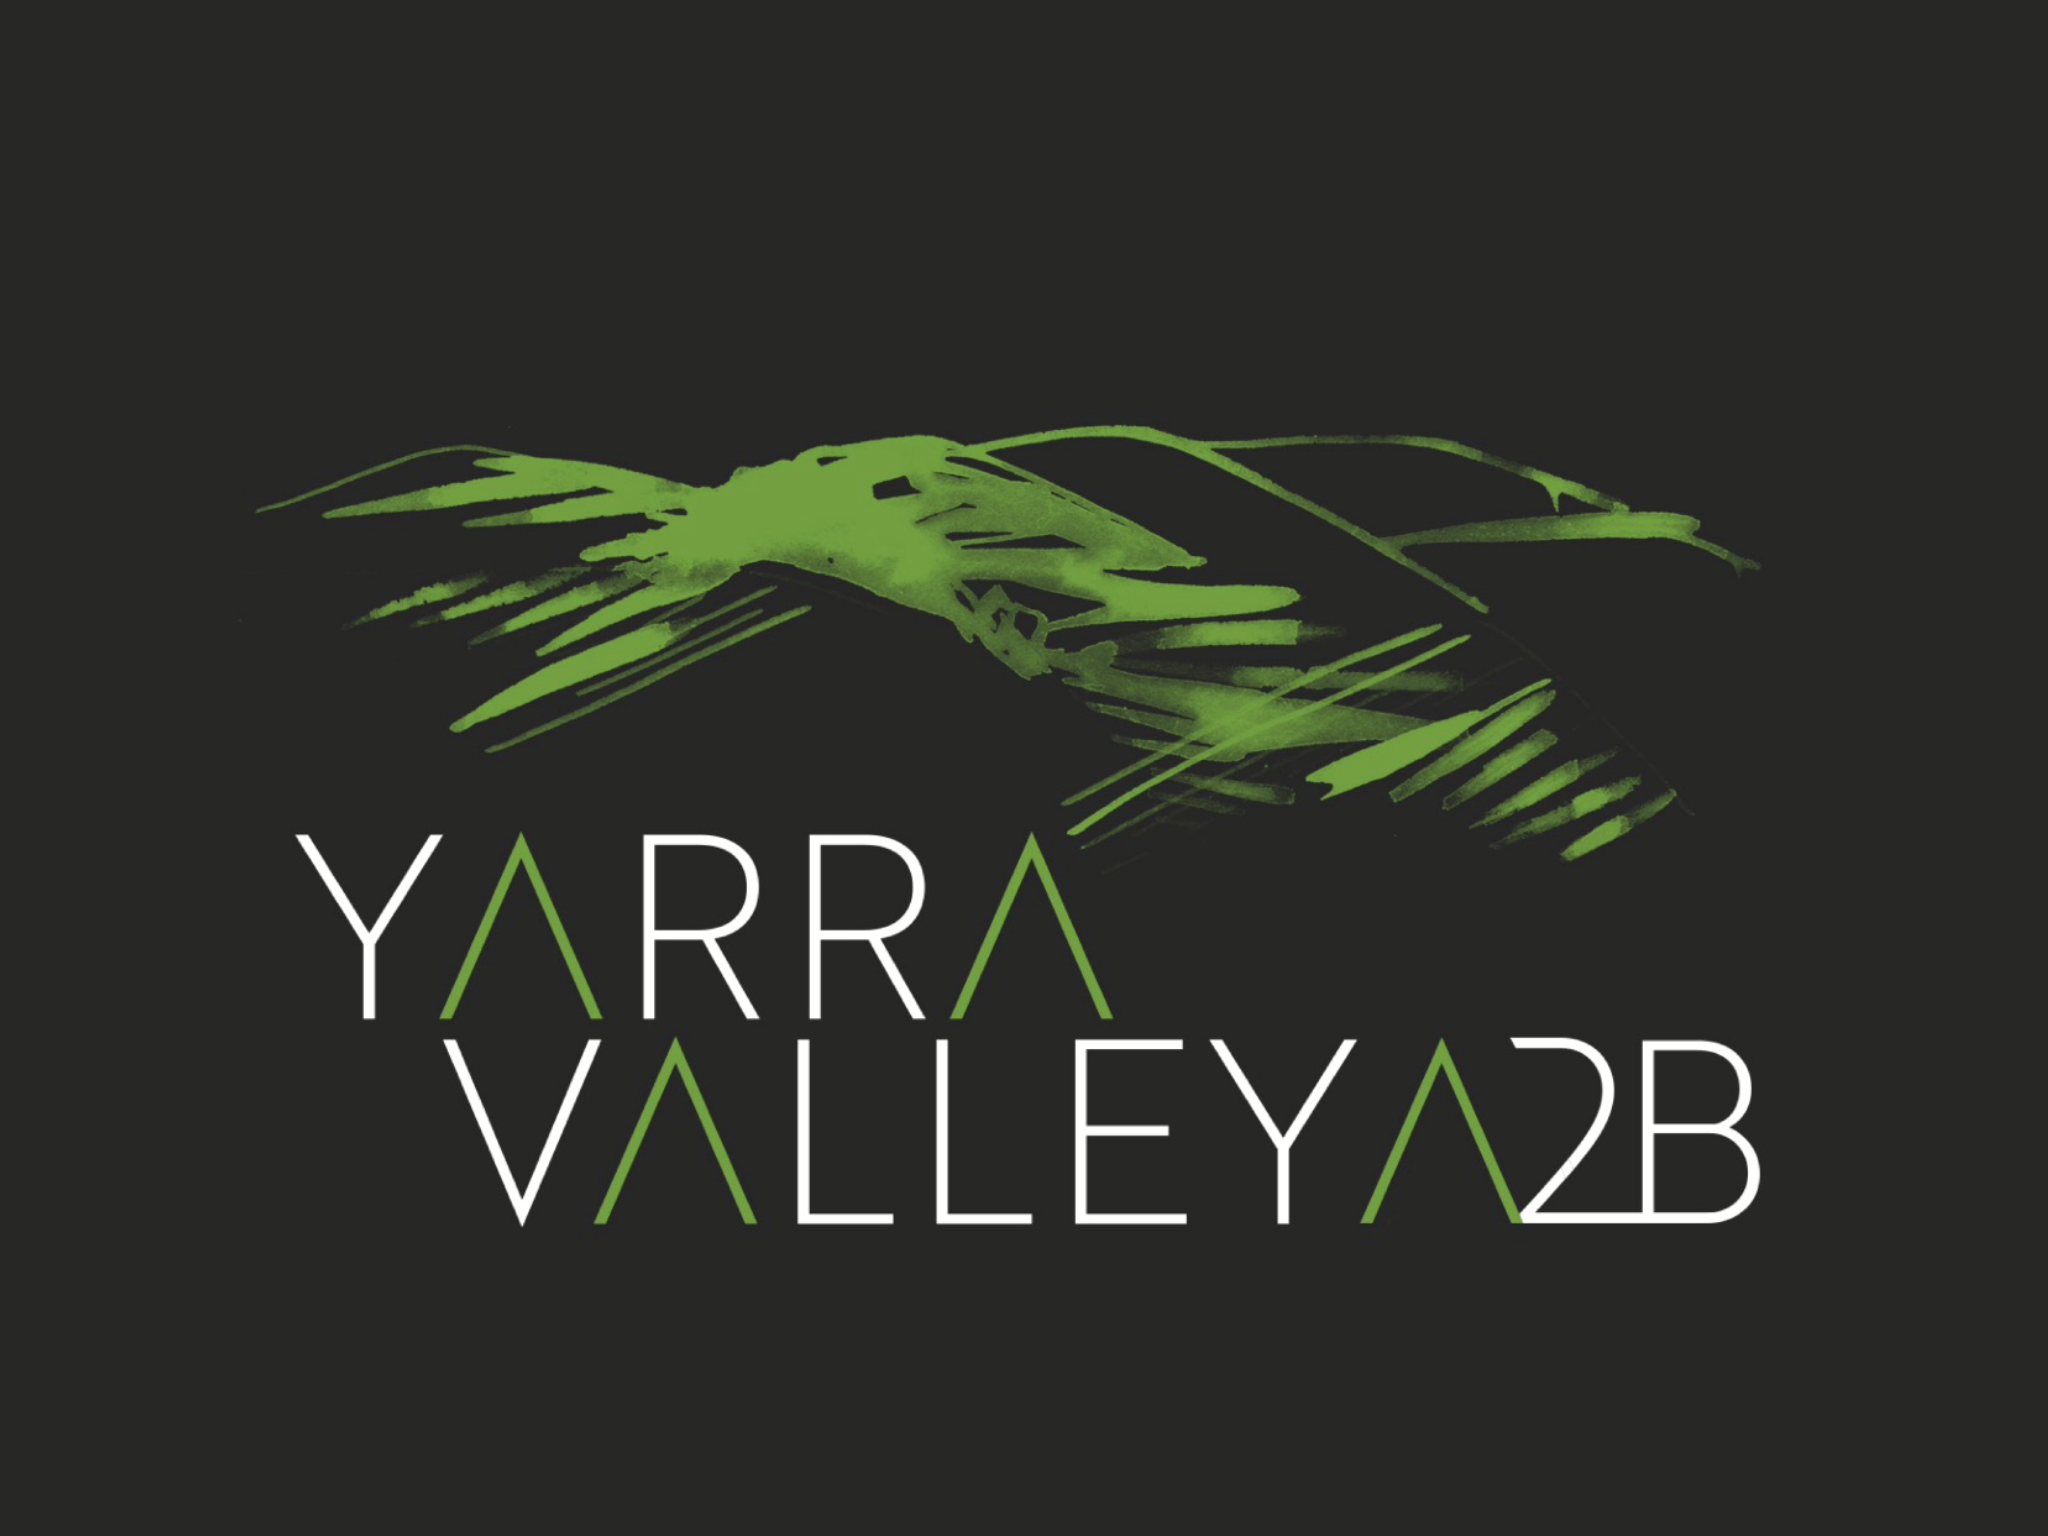 Yarra Valley A2B logo.PNG